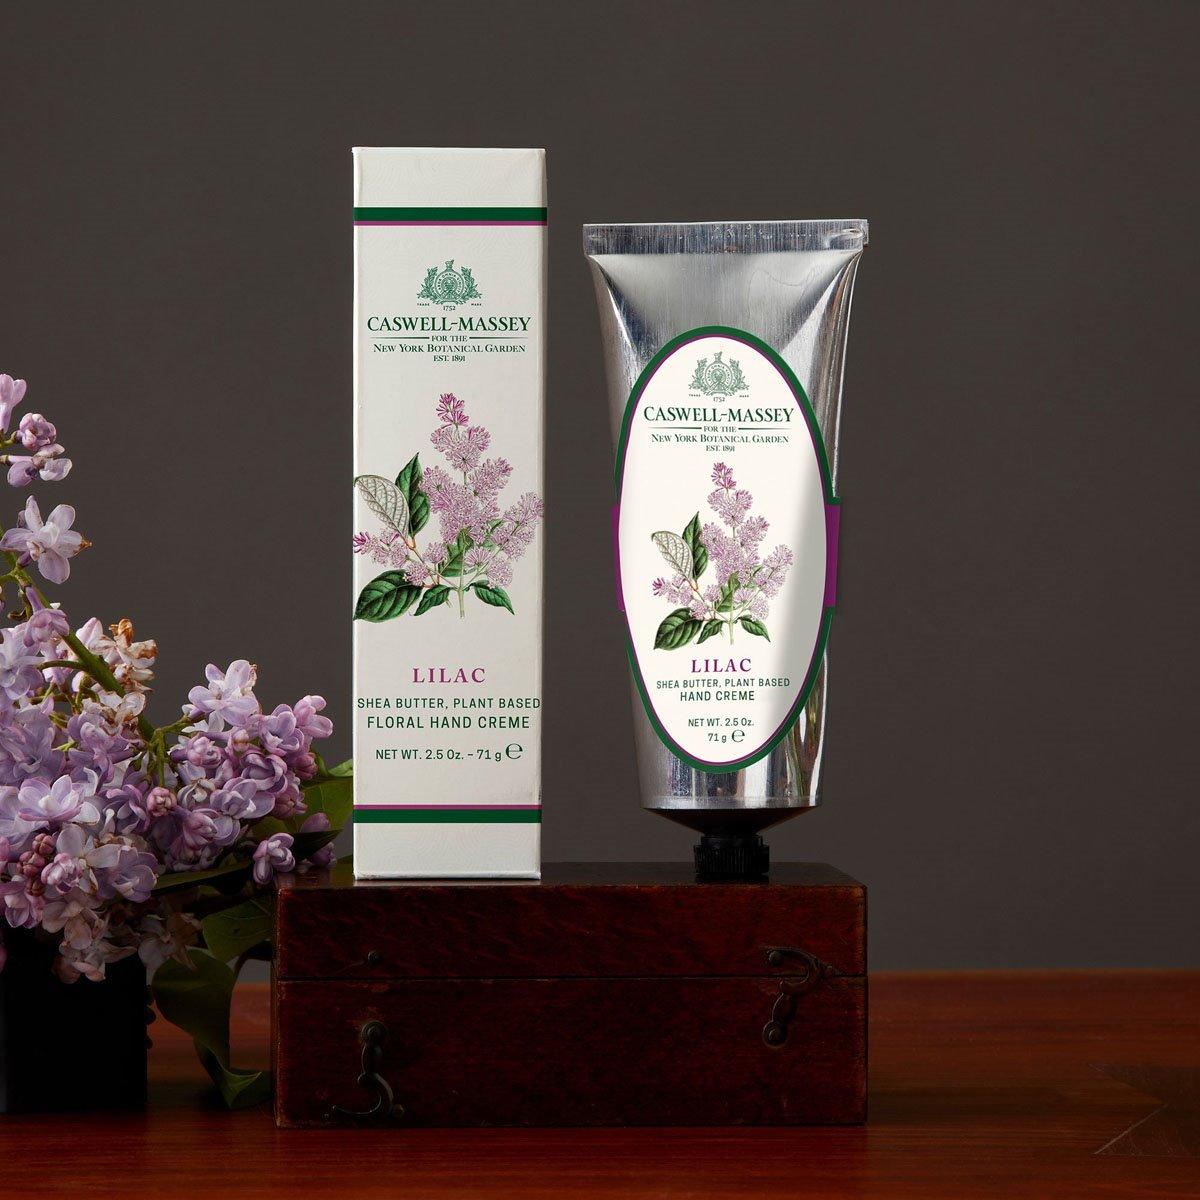 Caswell-Massey NYBG Lilac Hand Cream